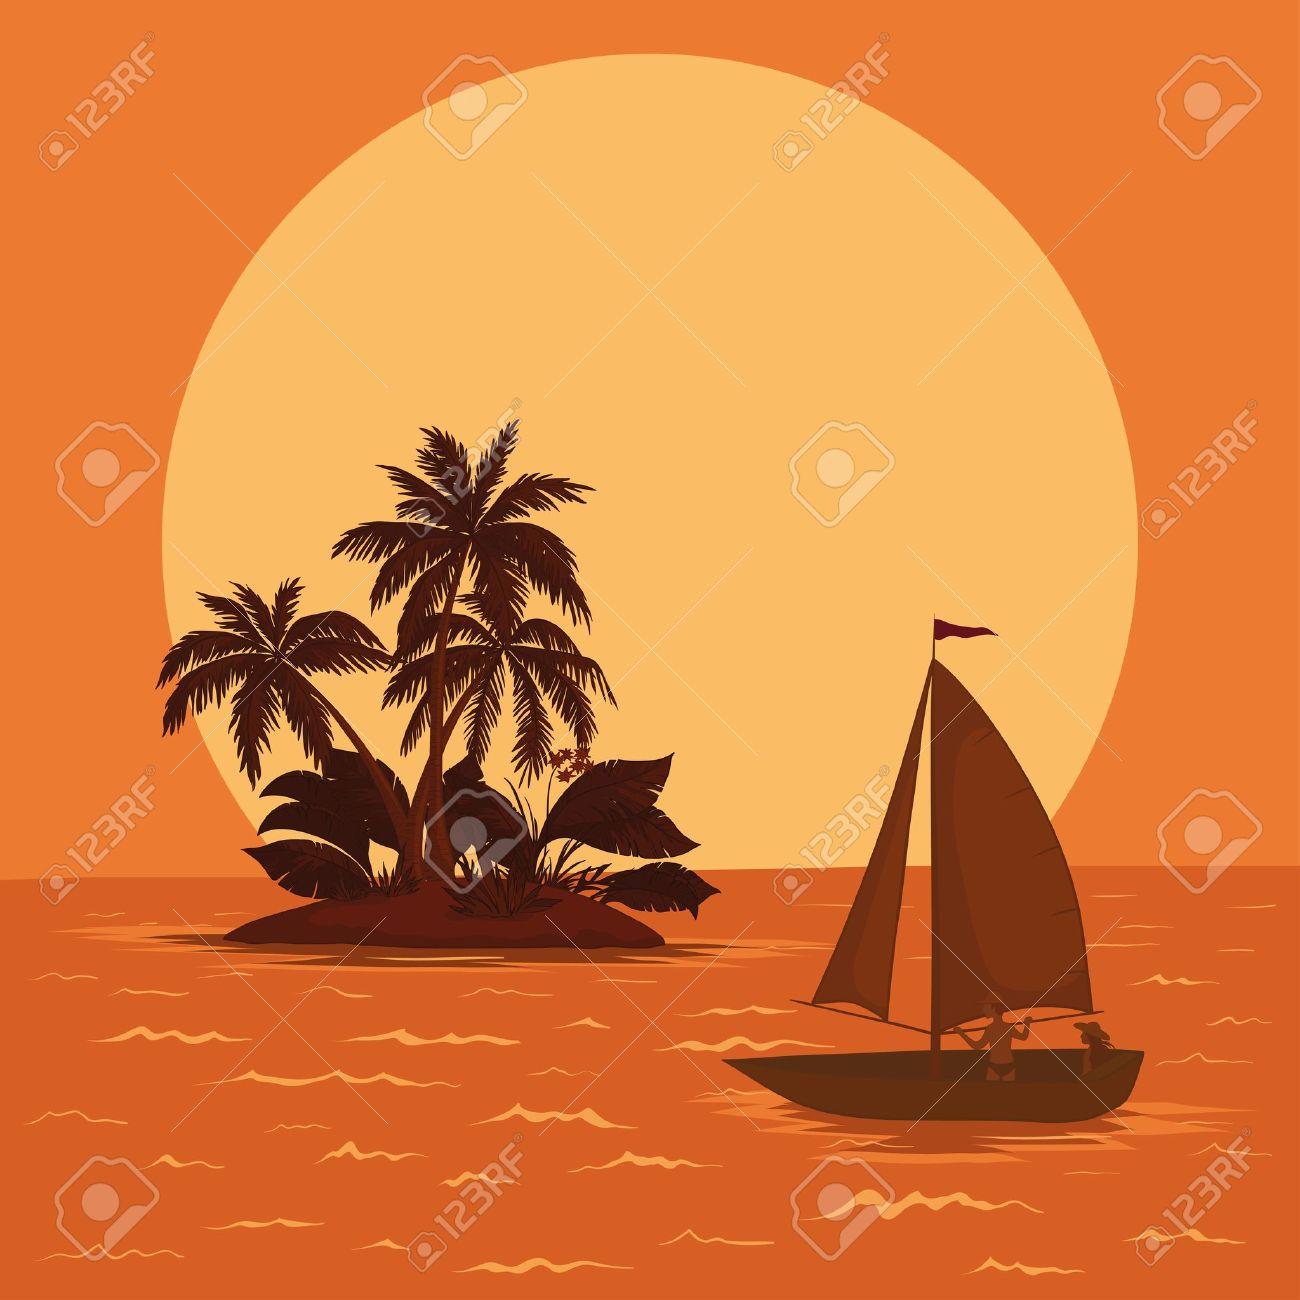 3,663 Sun Sails Cliparts, Stock Vector And Royalty Free Sun Sails.